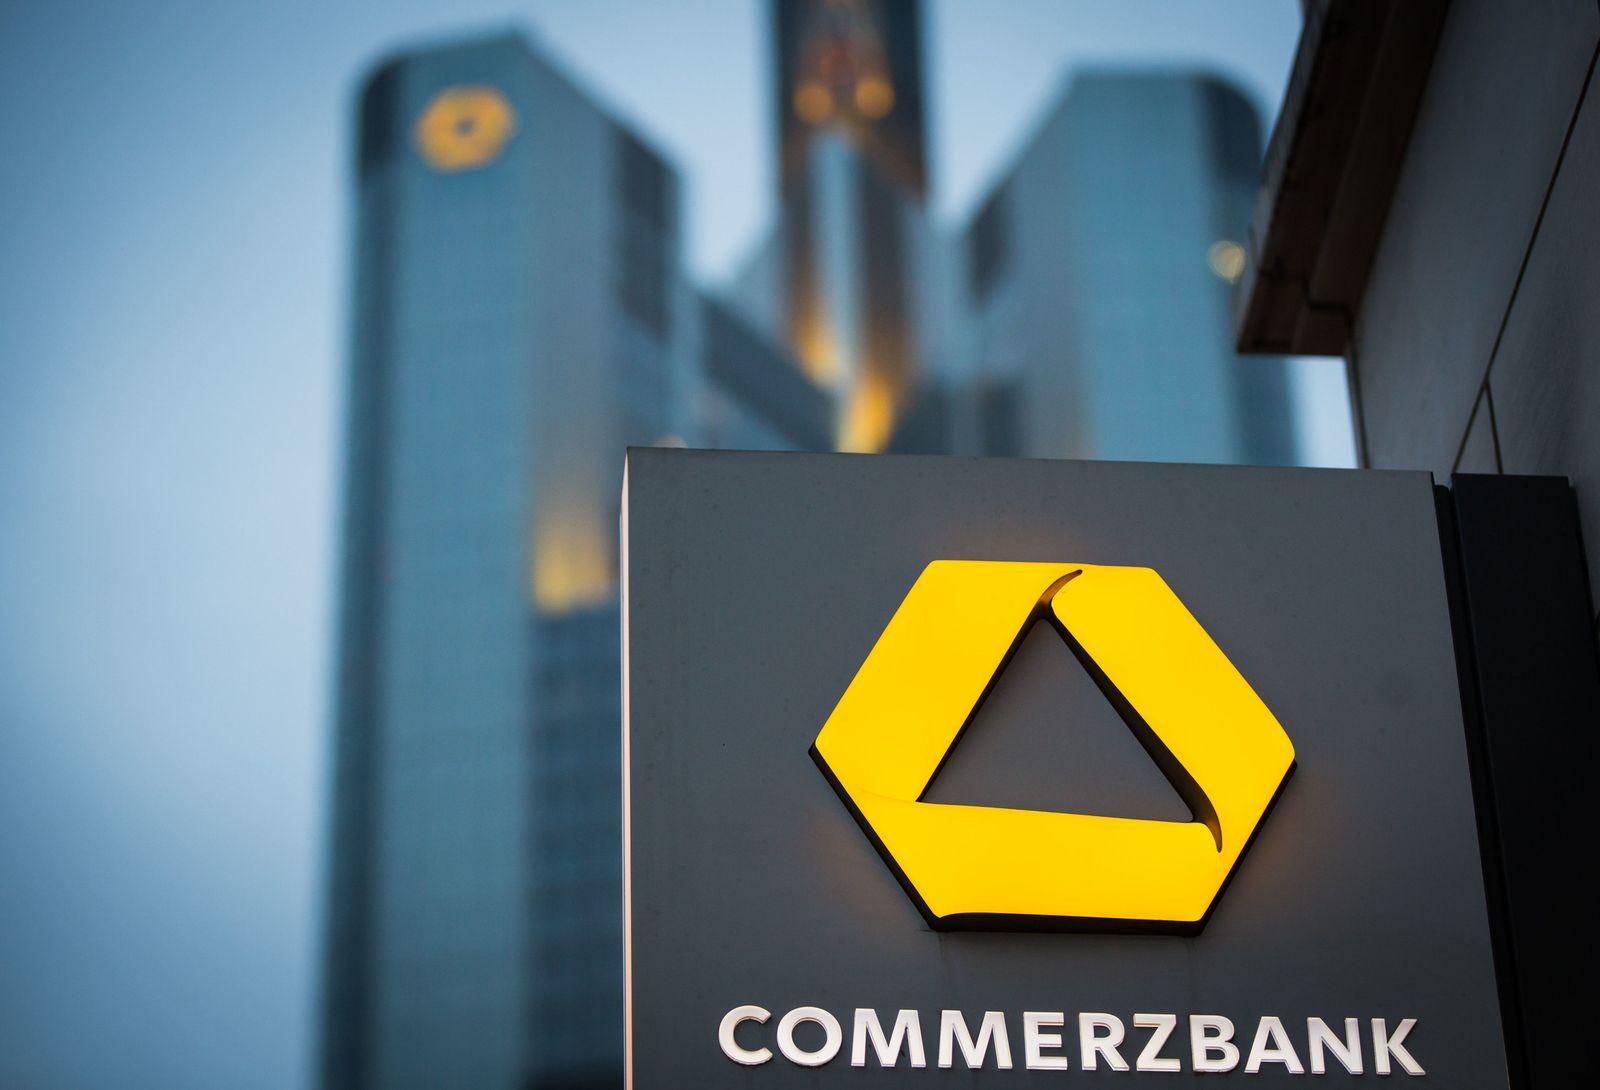 Verdi appelliert an neue Commerzbank-Führung